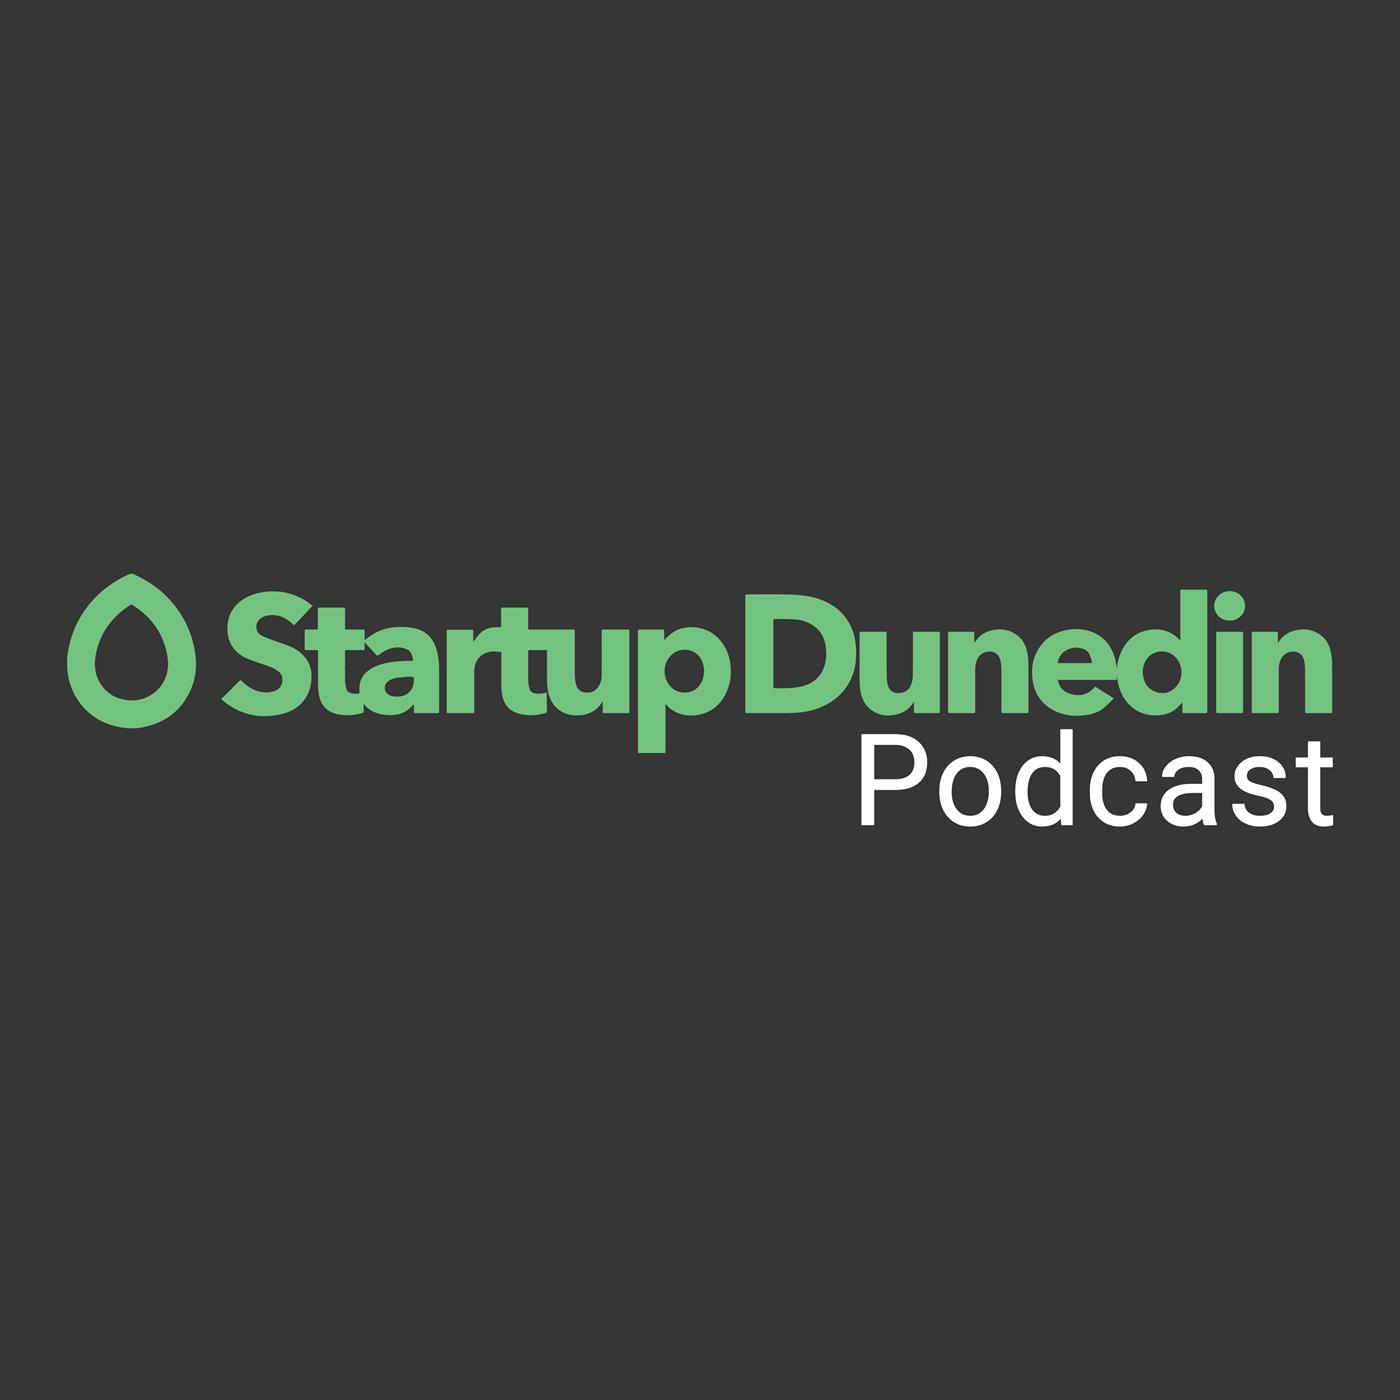 Startup Dunedin Podcast